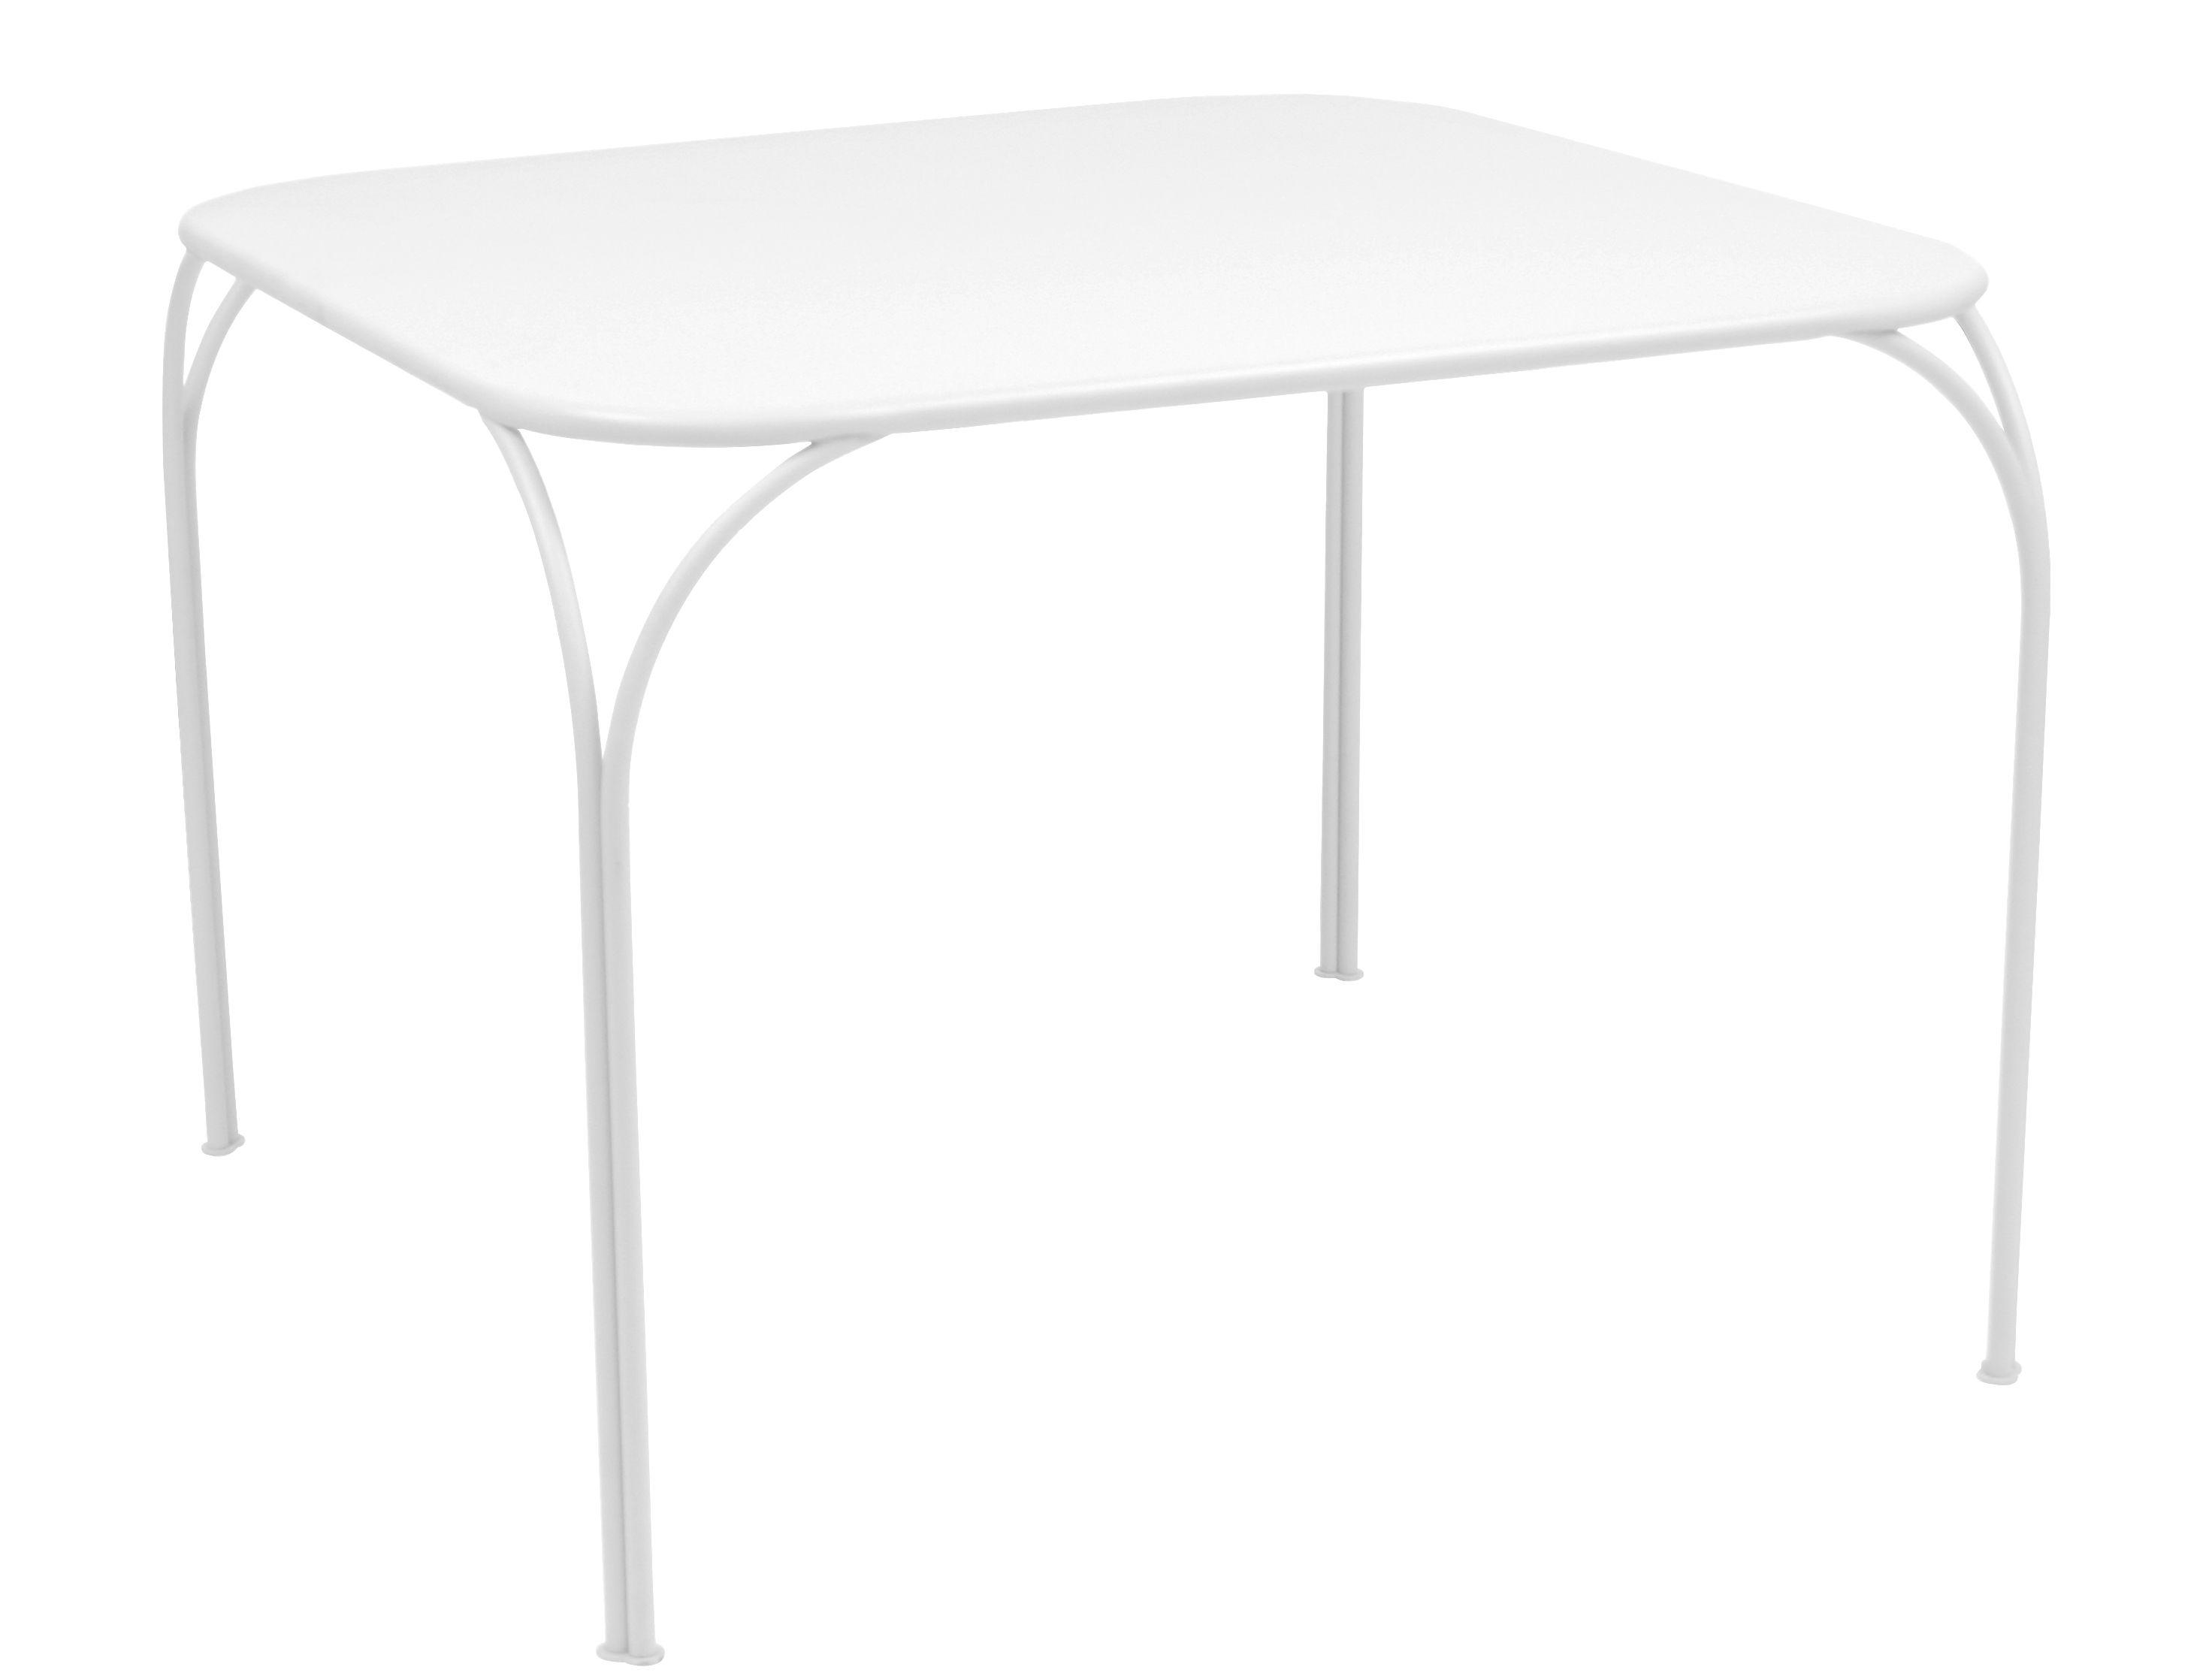 kintbury 100 x 100 cm fermob tisch. Black Bedroom Furniture Sets. Home Design Ideas